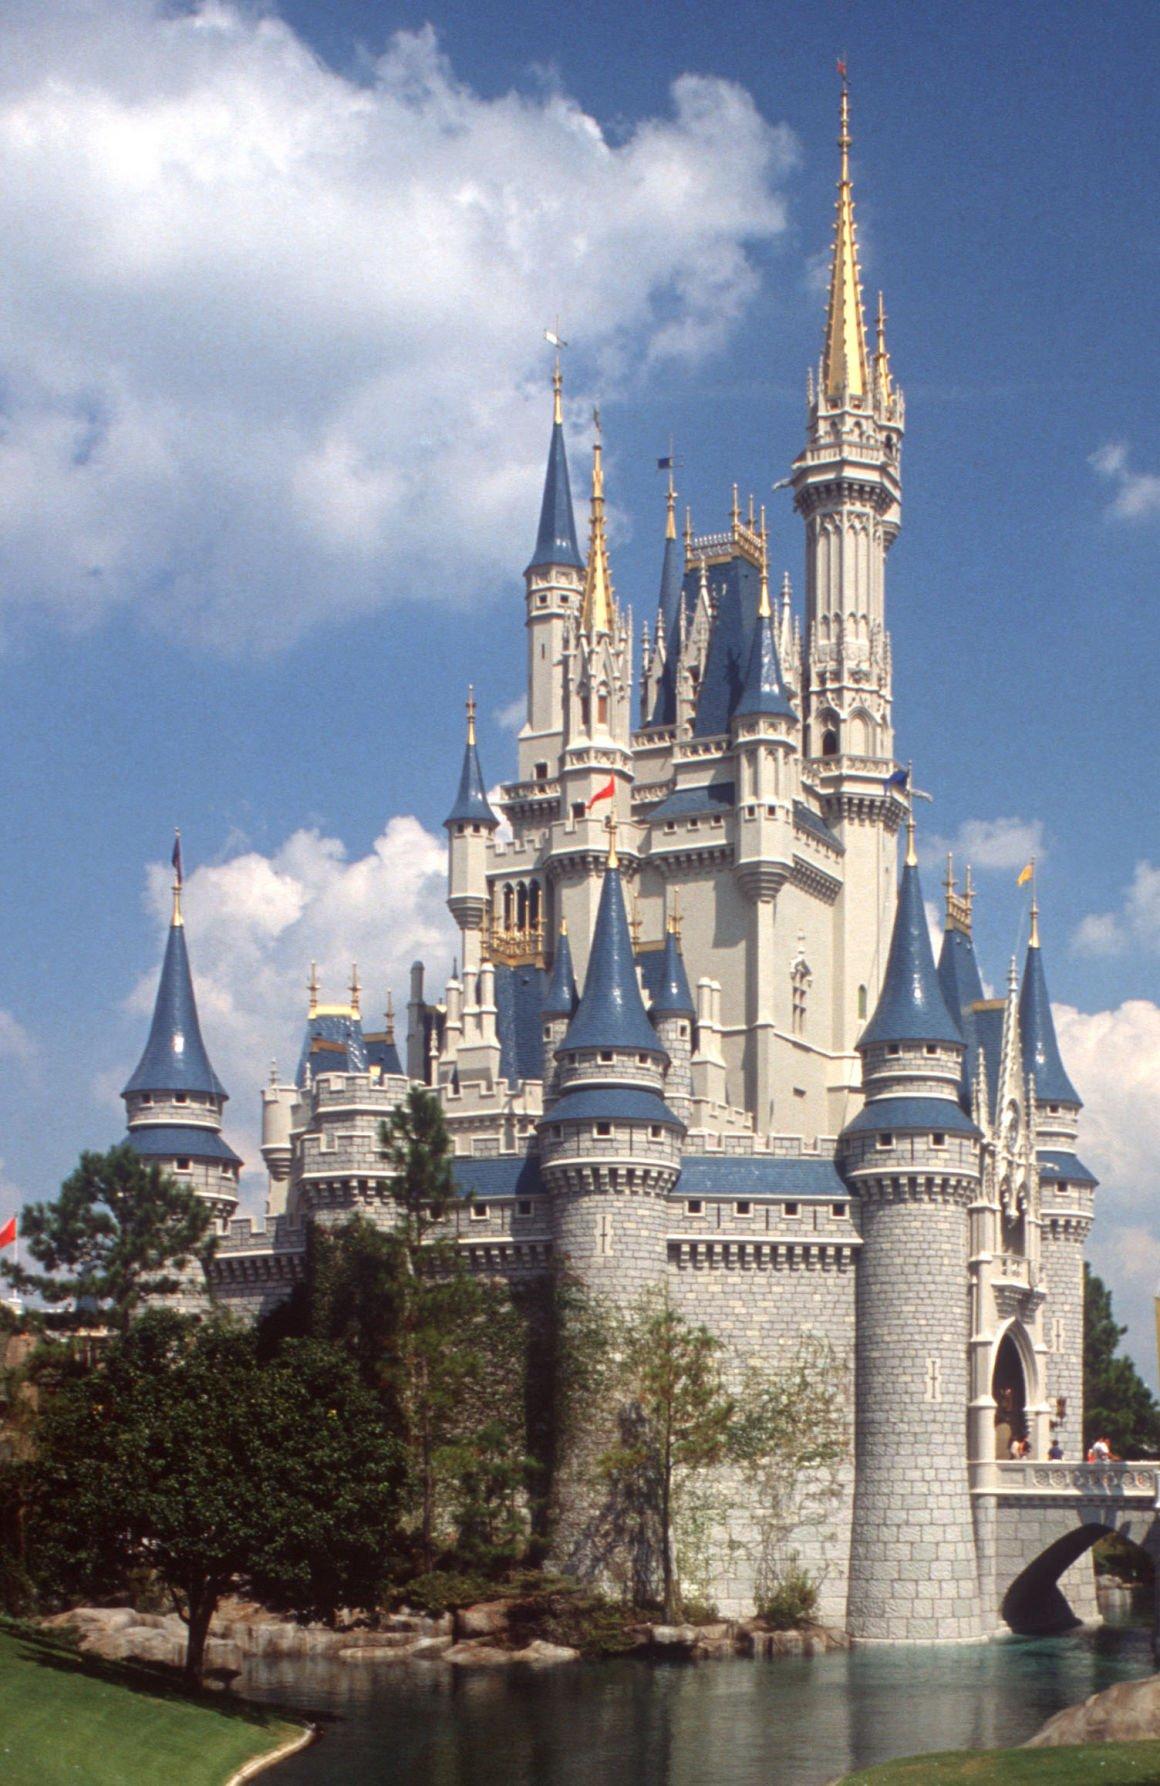 Disney World is erasing evidence of alligators crocodiles after